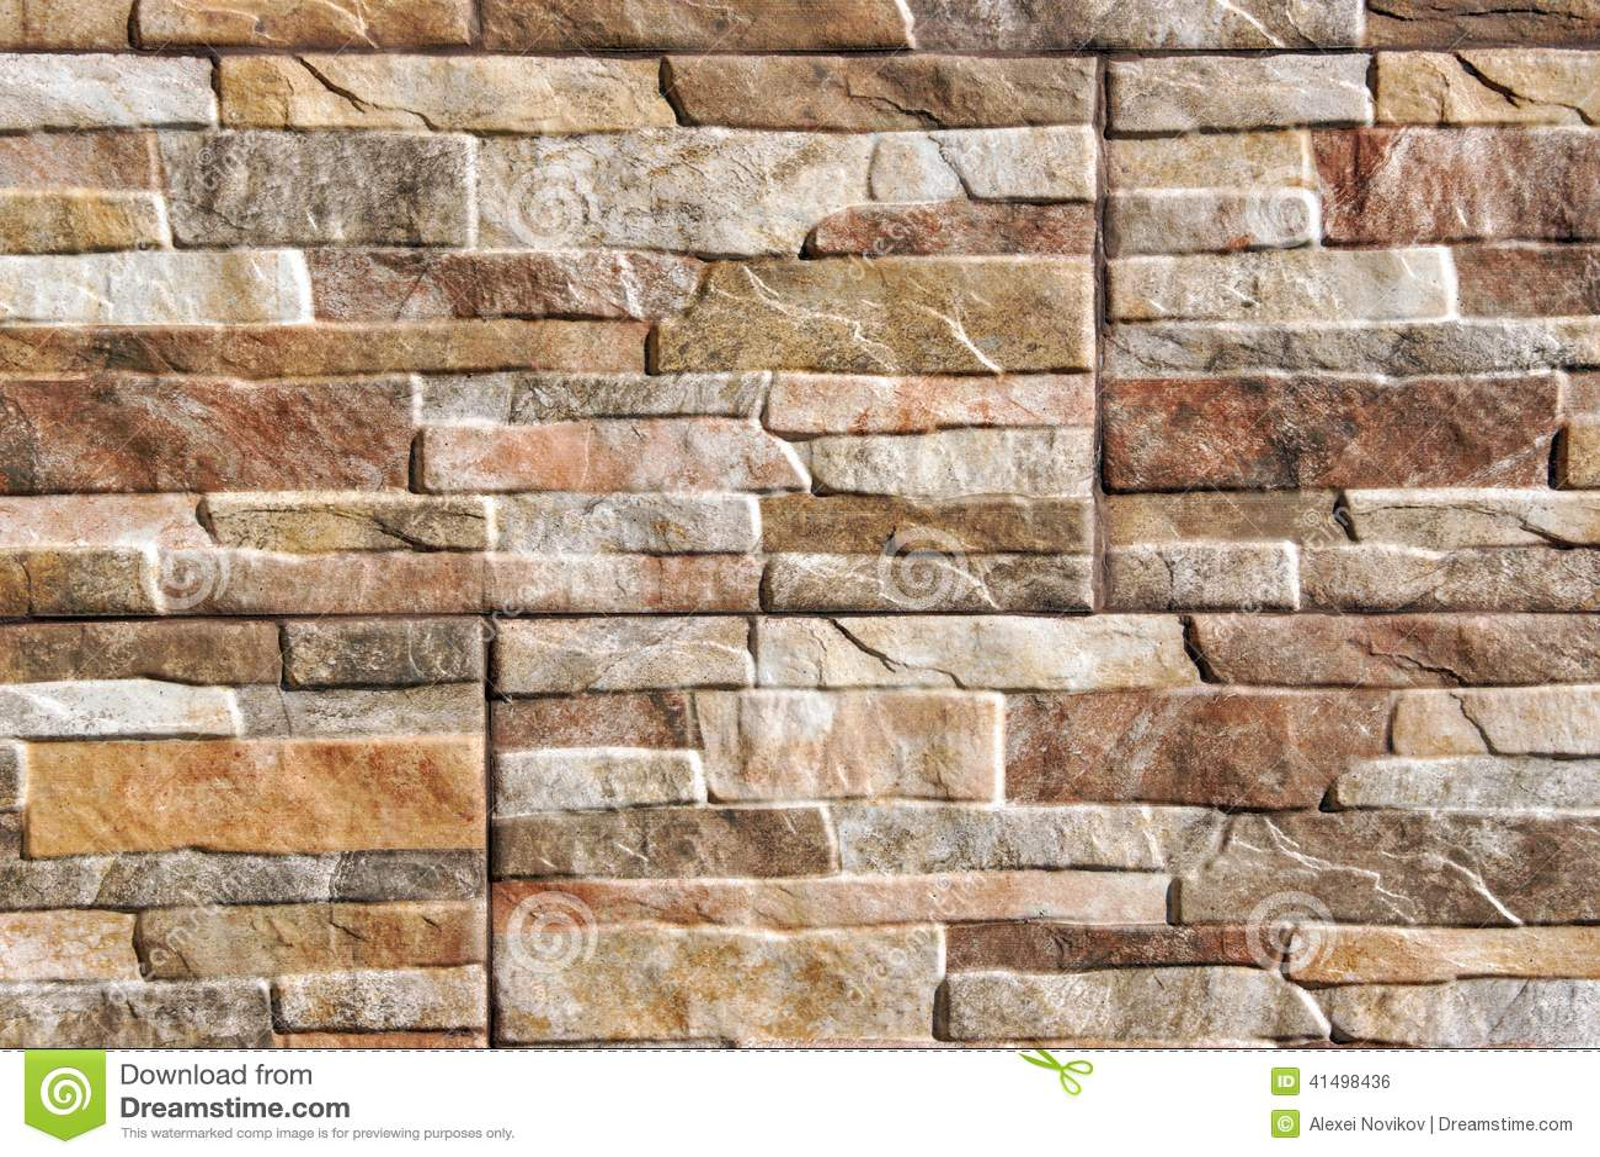 Ceramic Stone Tiles Stock Photo Image Of Element